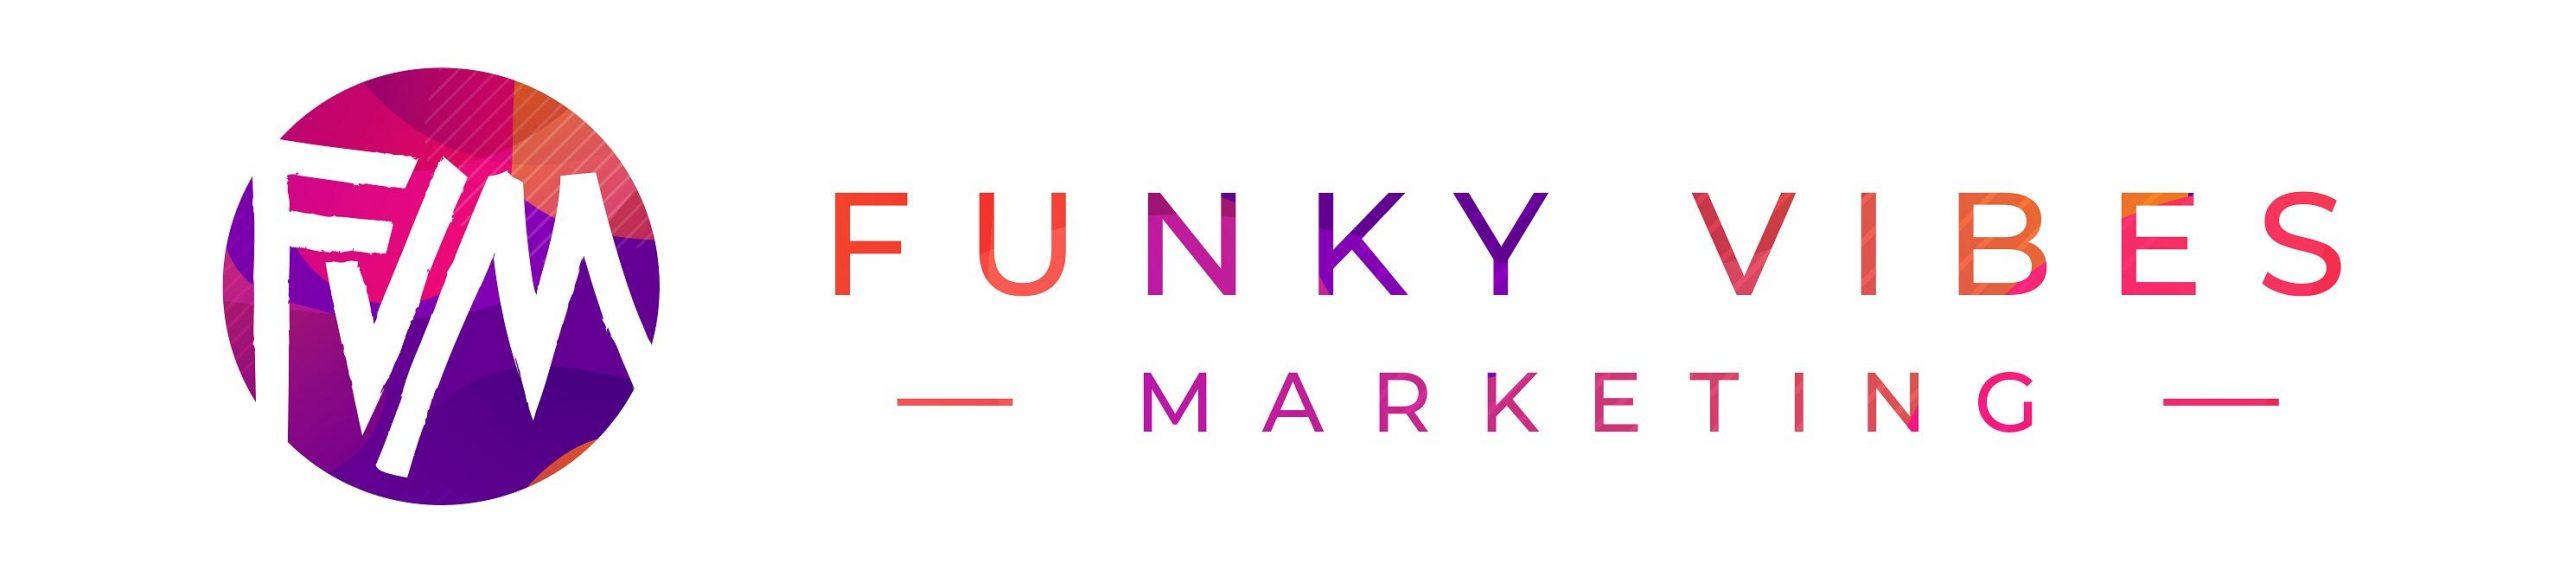 Funky-Vibes-Marketing-logo